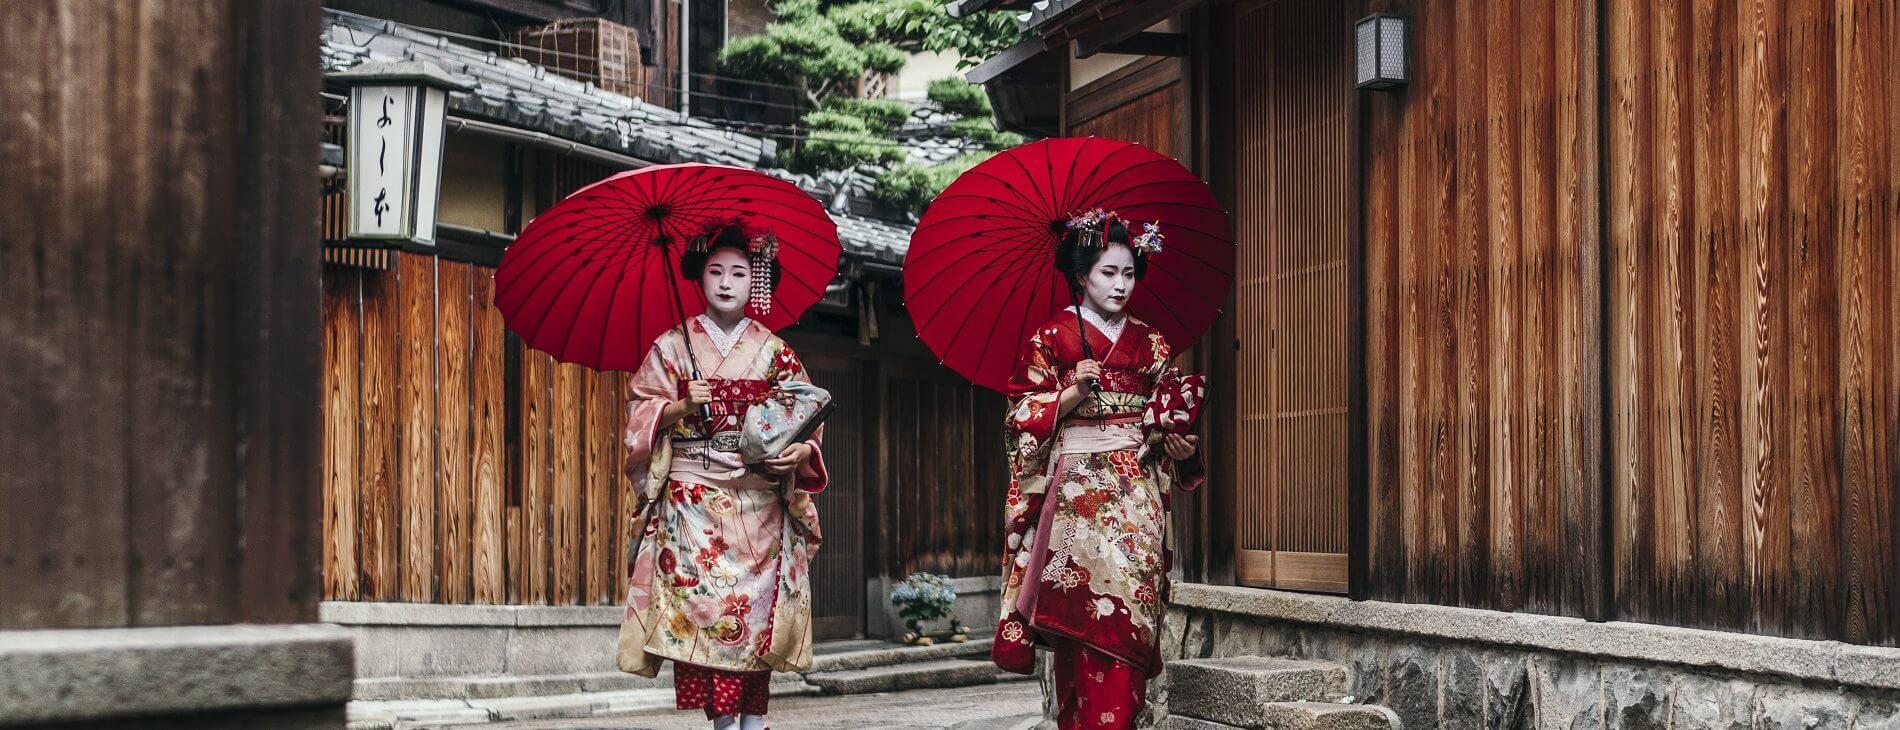 mastroviaggiatore-kyoto-Maiko geisha walking on a street of Gion in Kyoto second